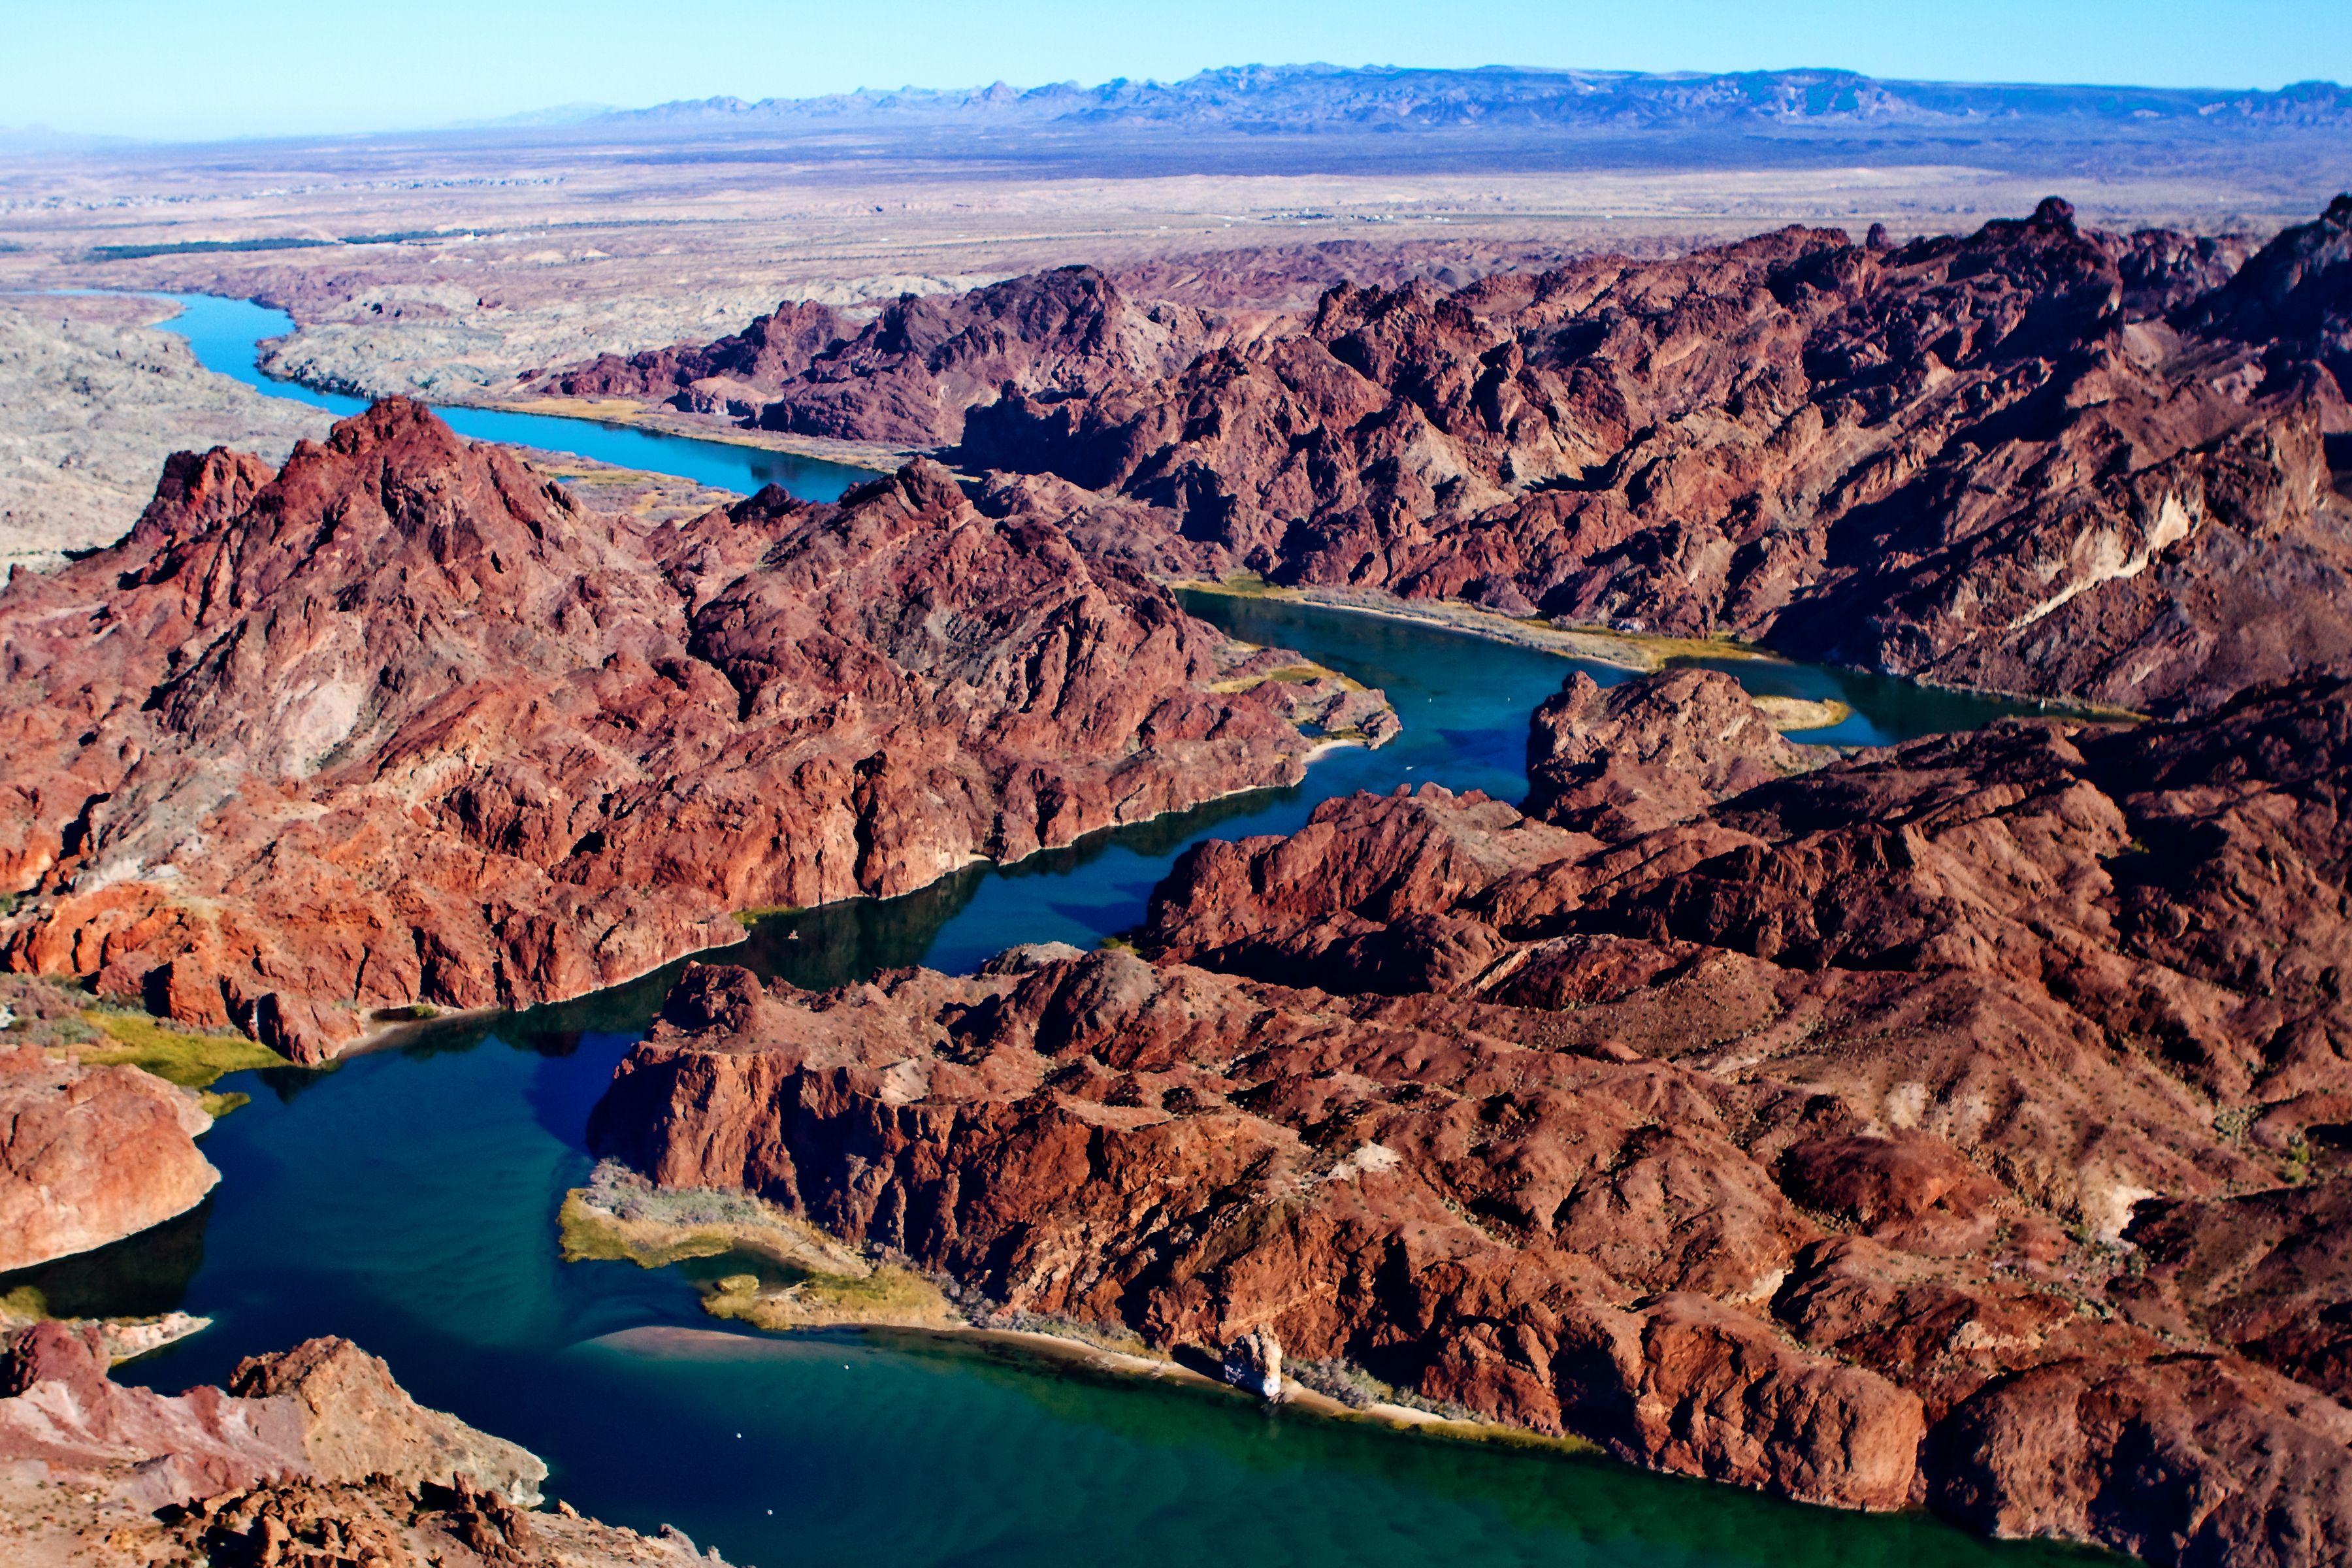 Colorado River, Lake Havasu City, AZ